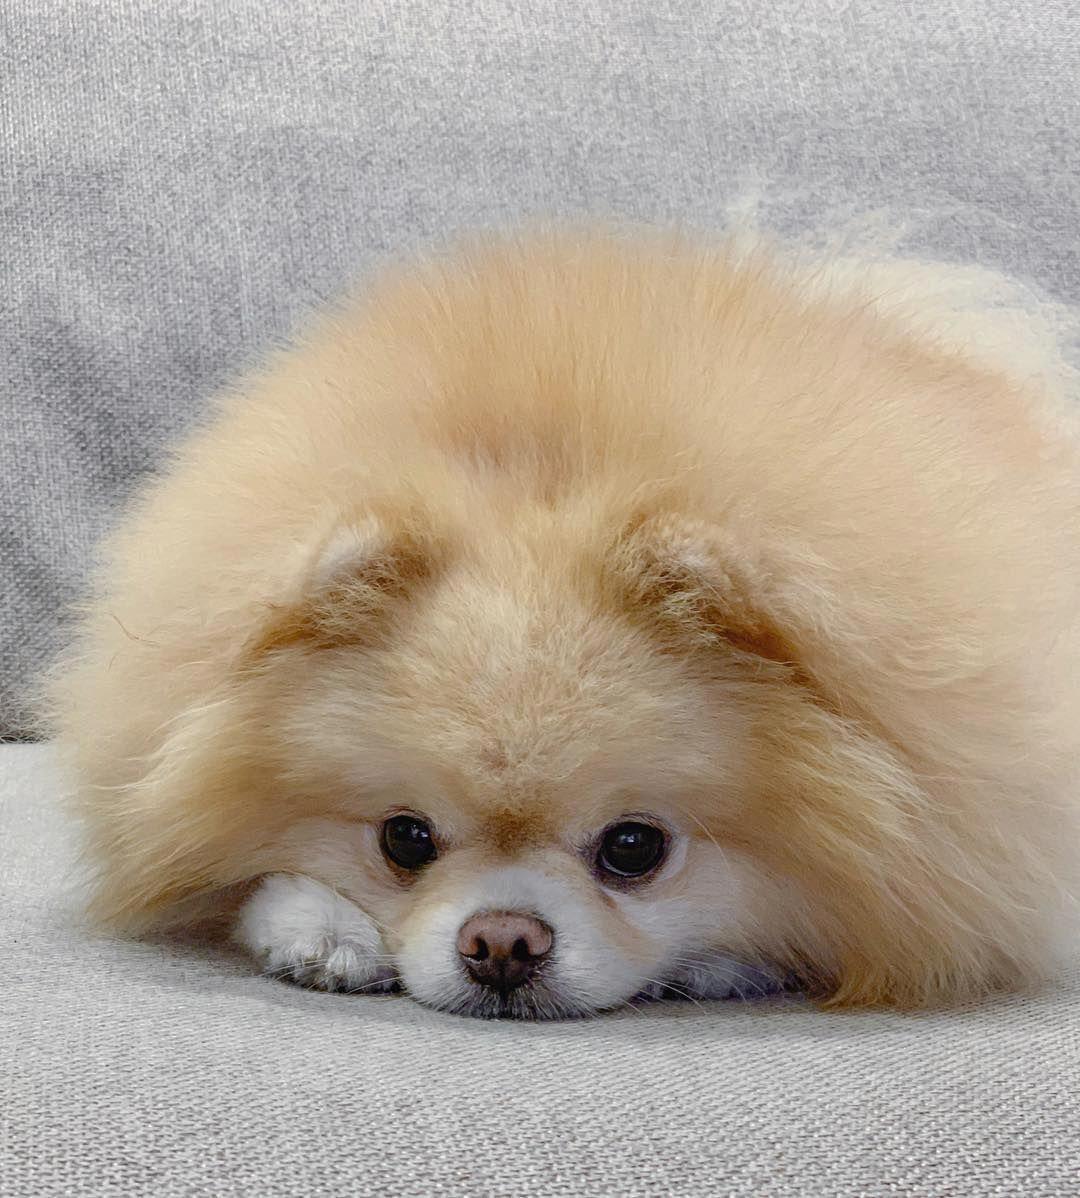 Queridinho Amorinho Meninomax Boo Boo Awesome Do In 2020 Cute Baby Animals Puppies Baby Animals Funny